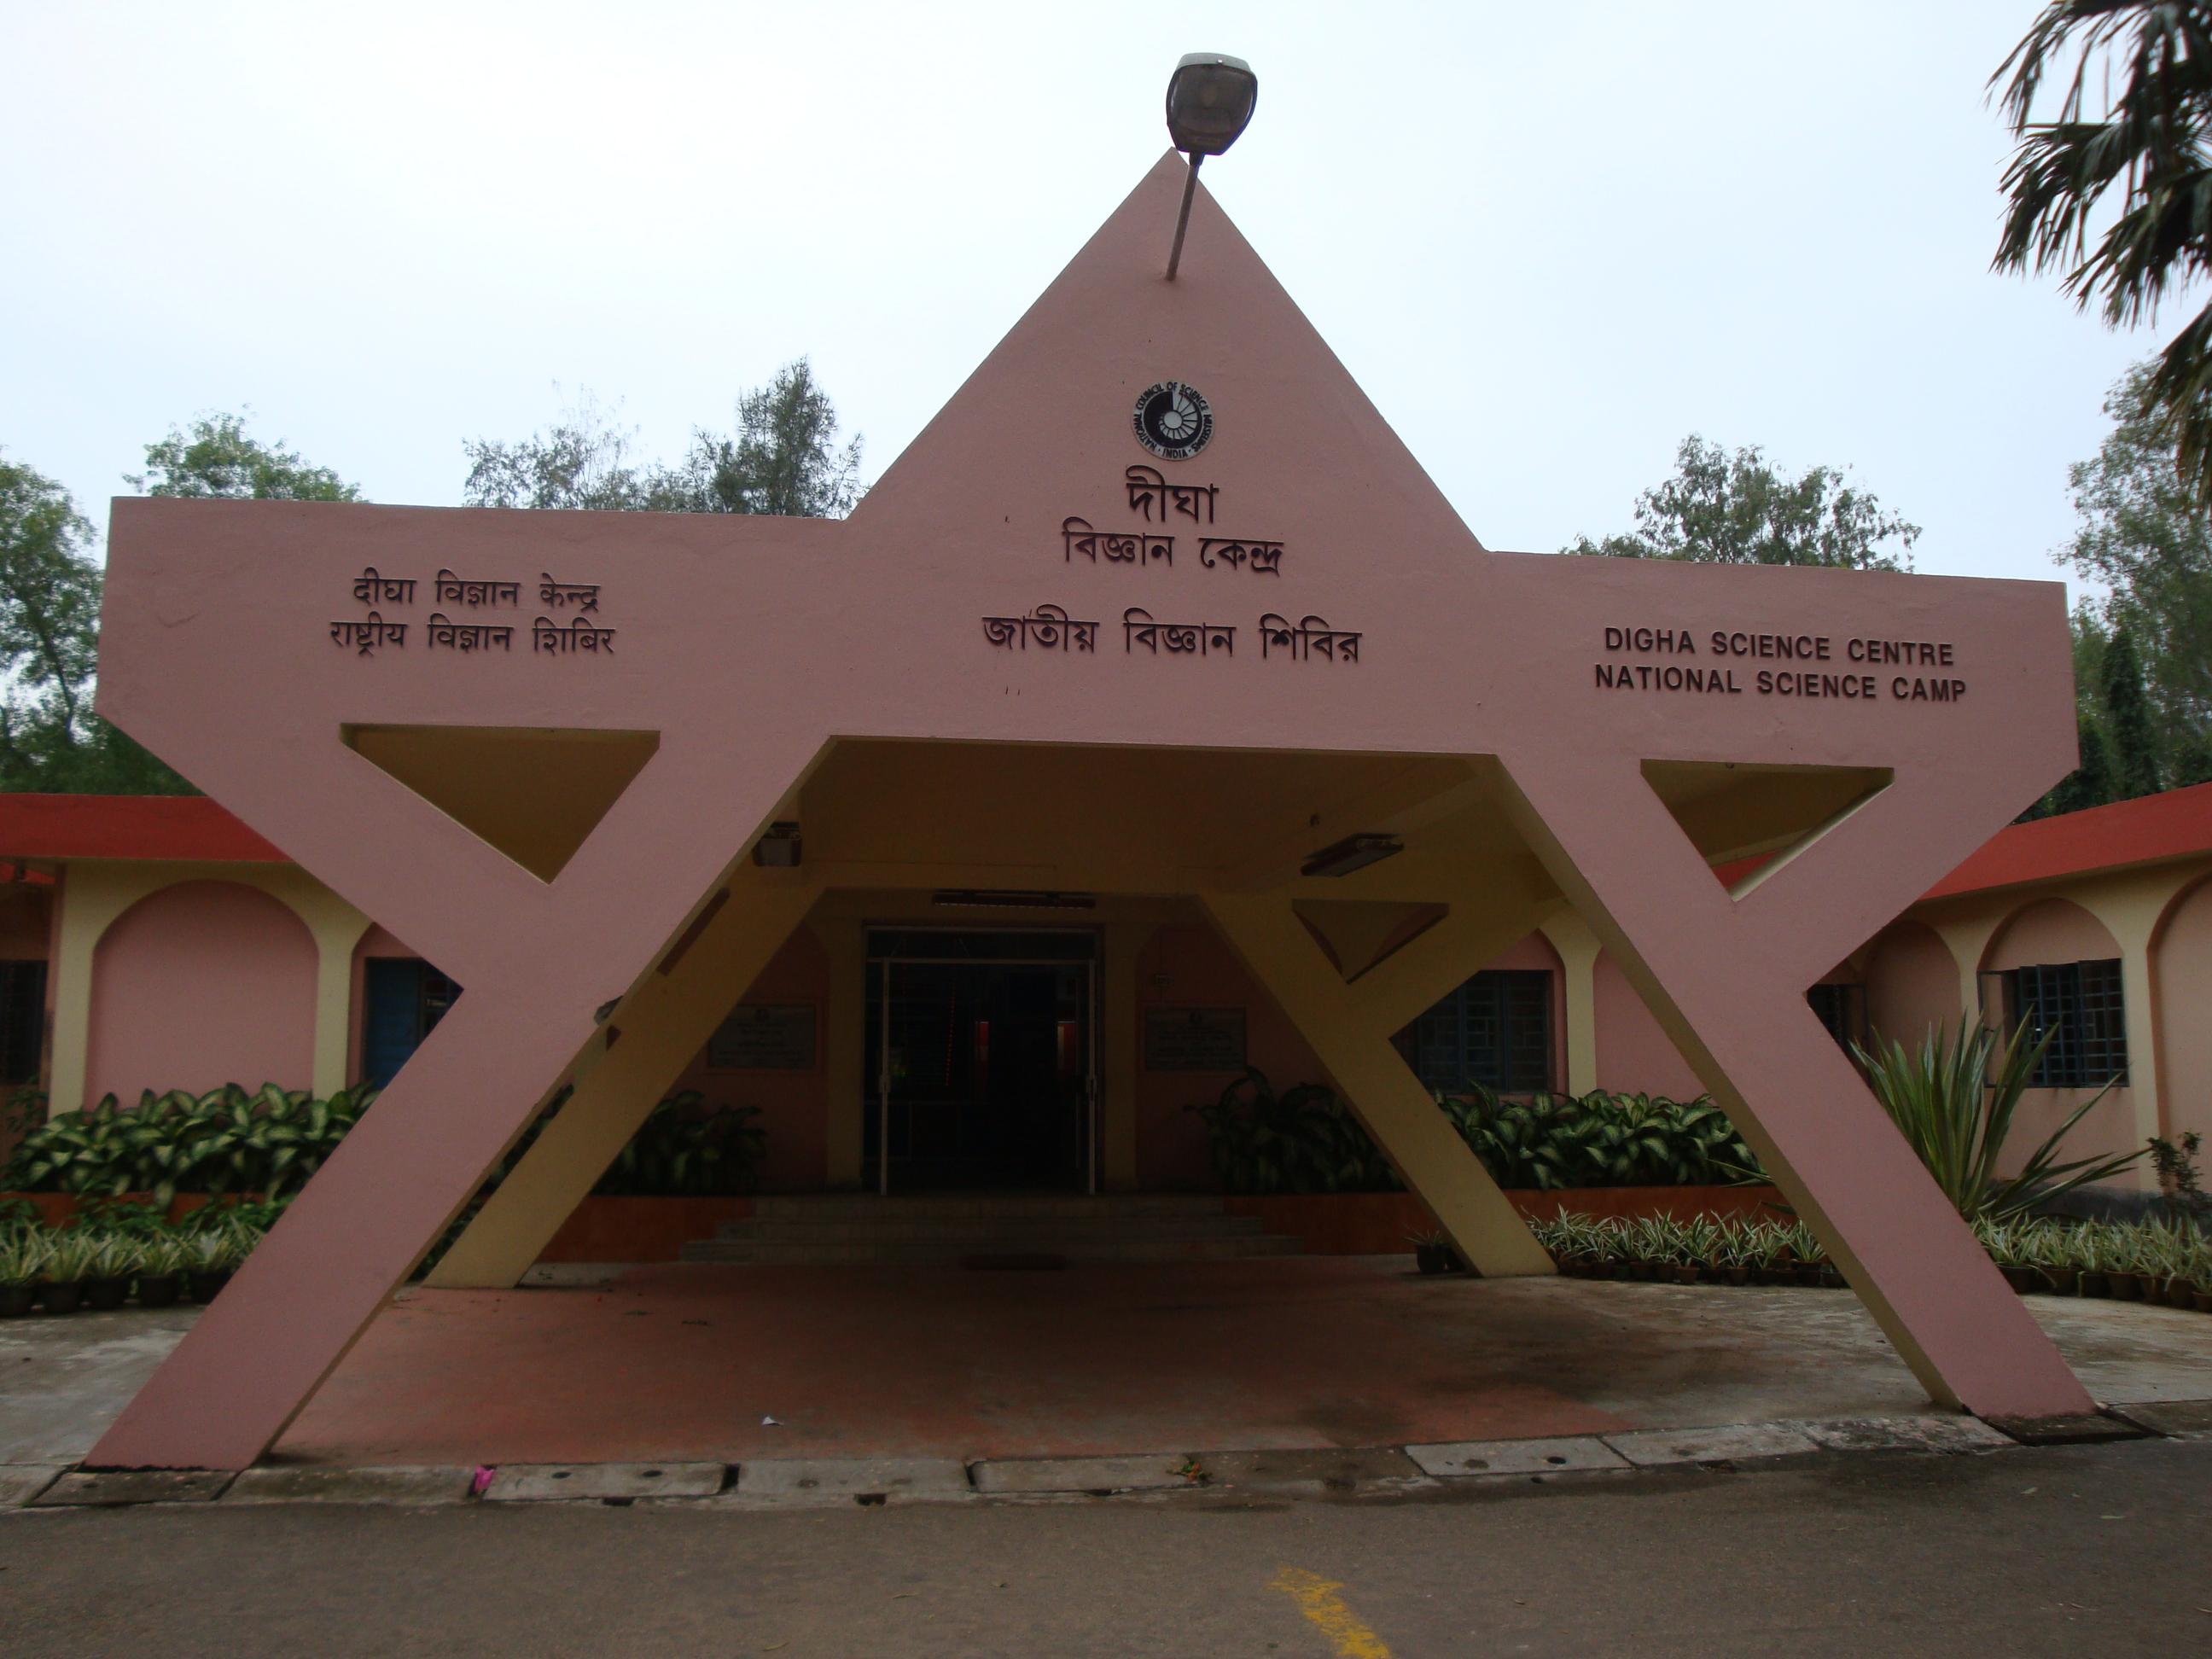 Trip to Digha - Ghumakkar - Inspiring travel experiences